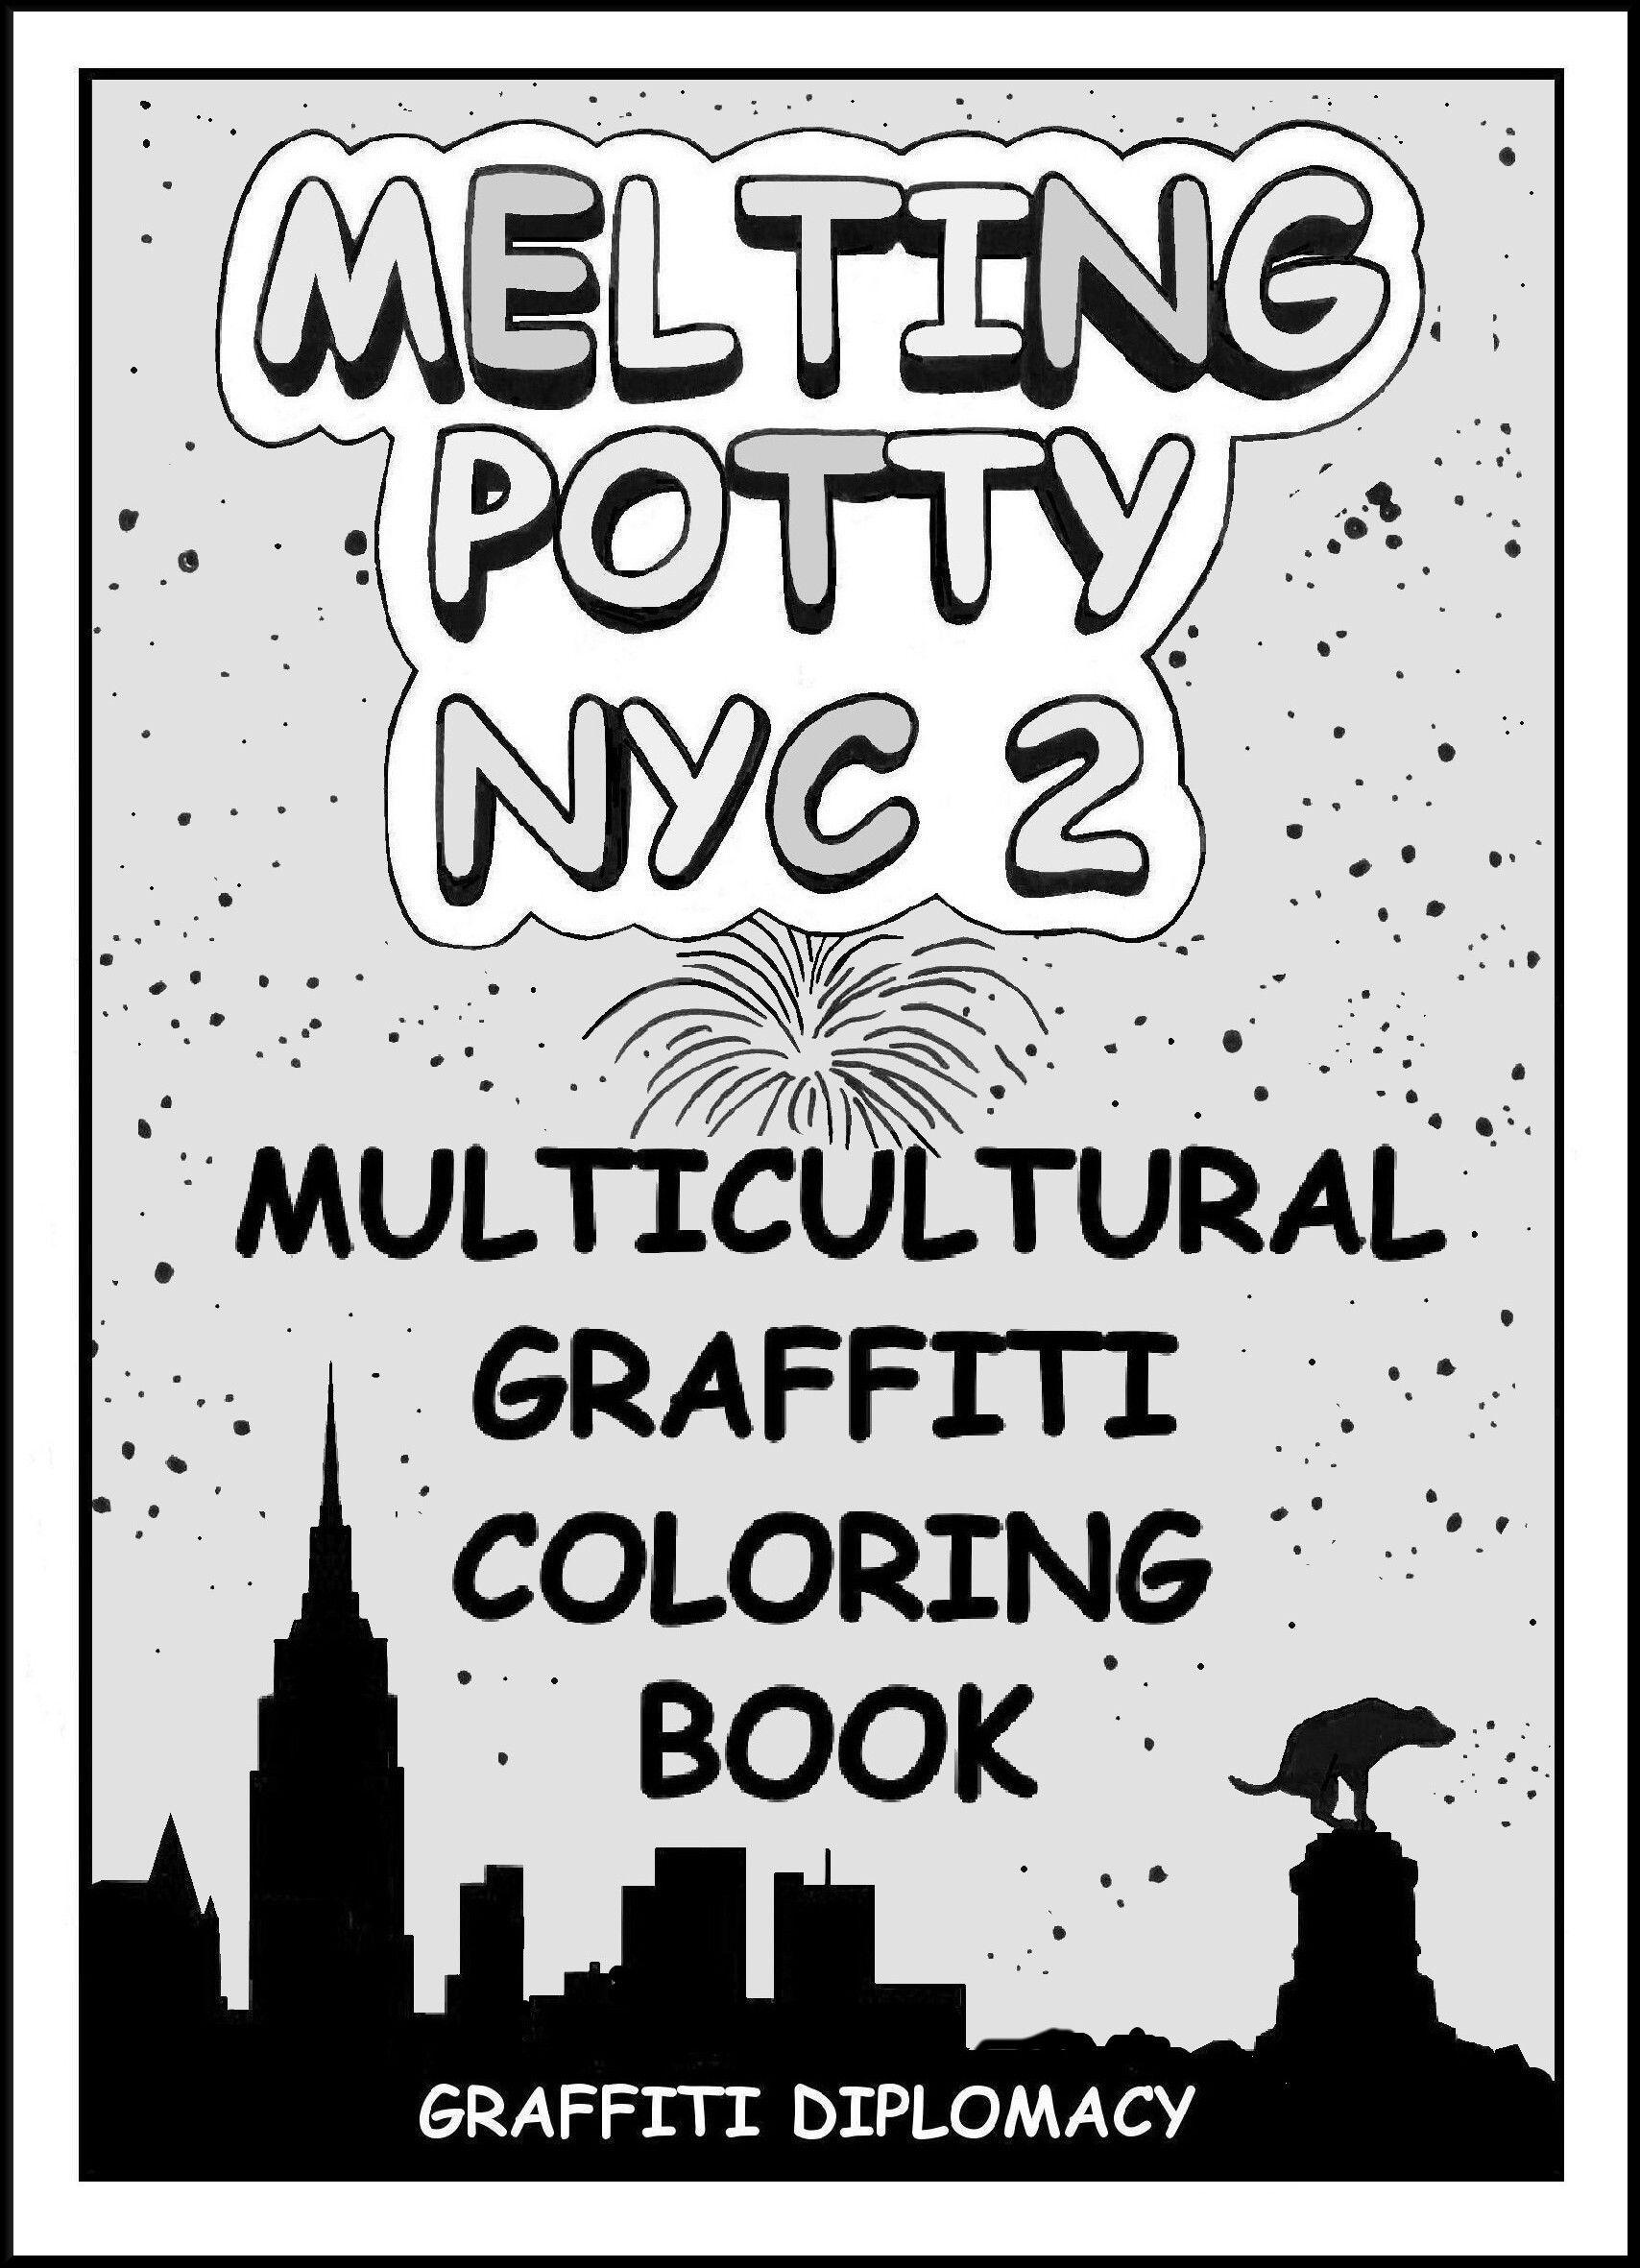 Multicultural Graffiti Coloring Book | Teach: Art | Pinterest ...